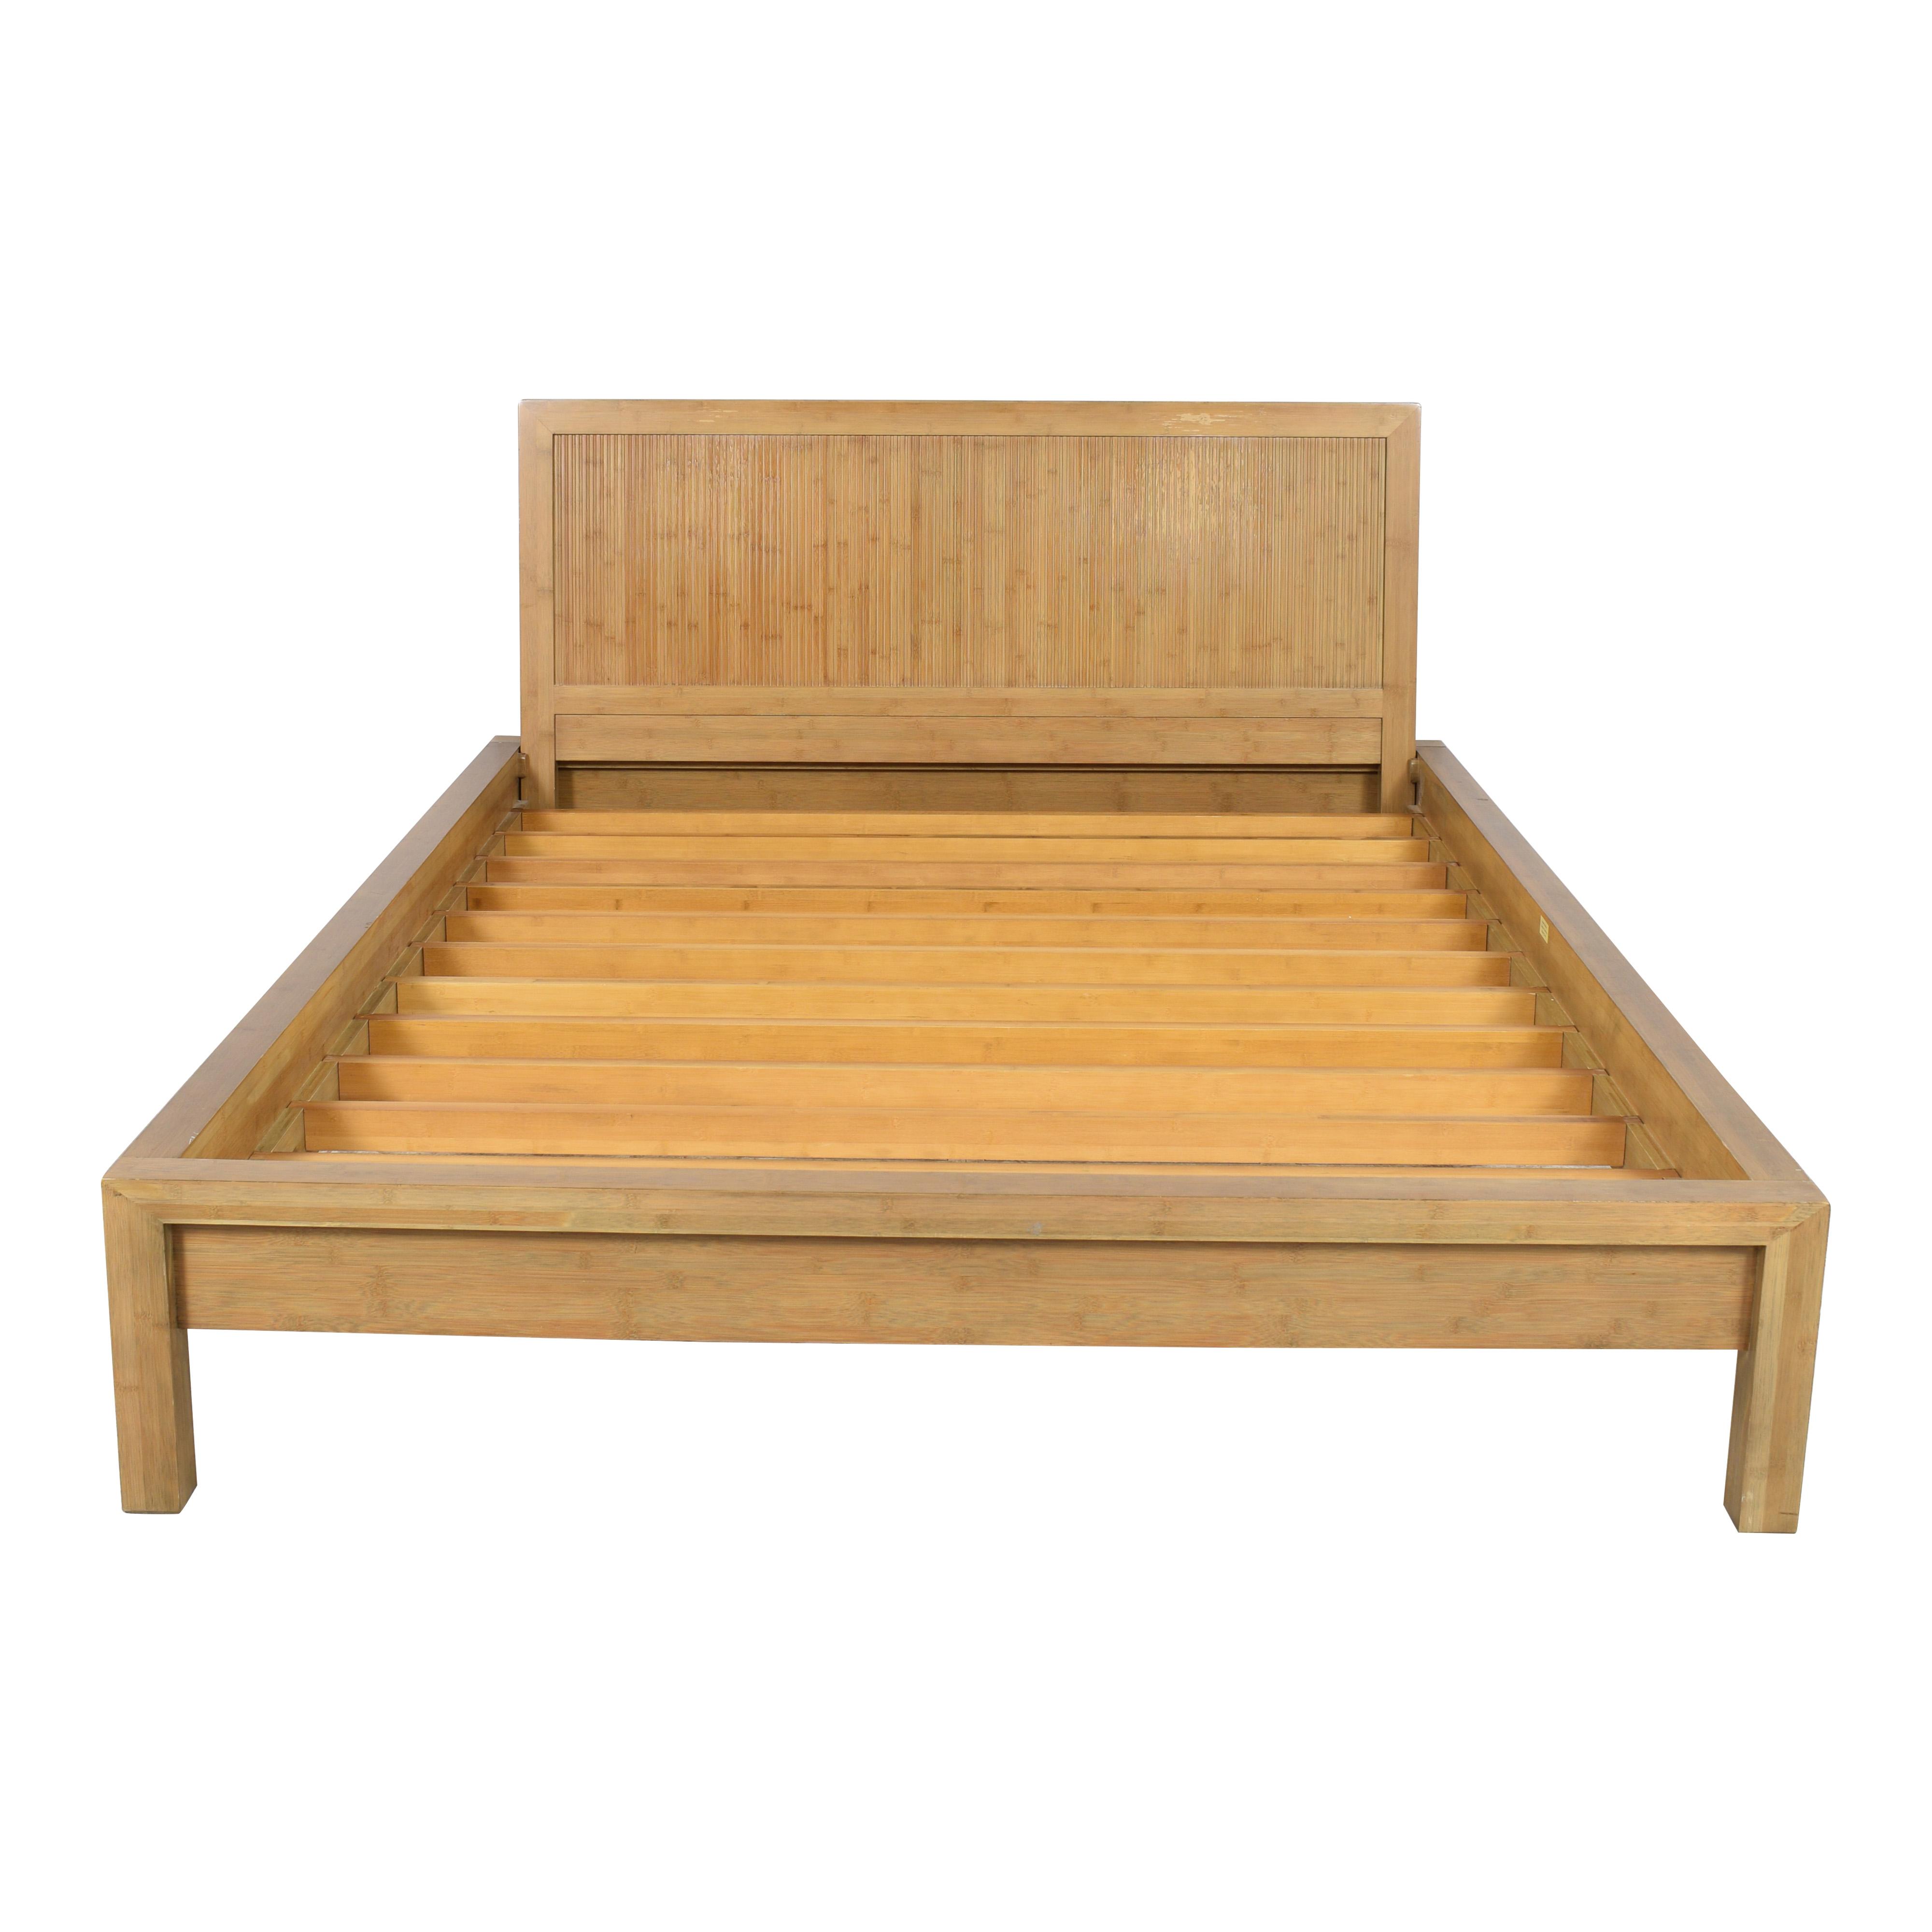 Room & Board Room & Board Queen Bamboo Timbre Maria Yee Platform Bed Bed Frames